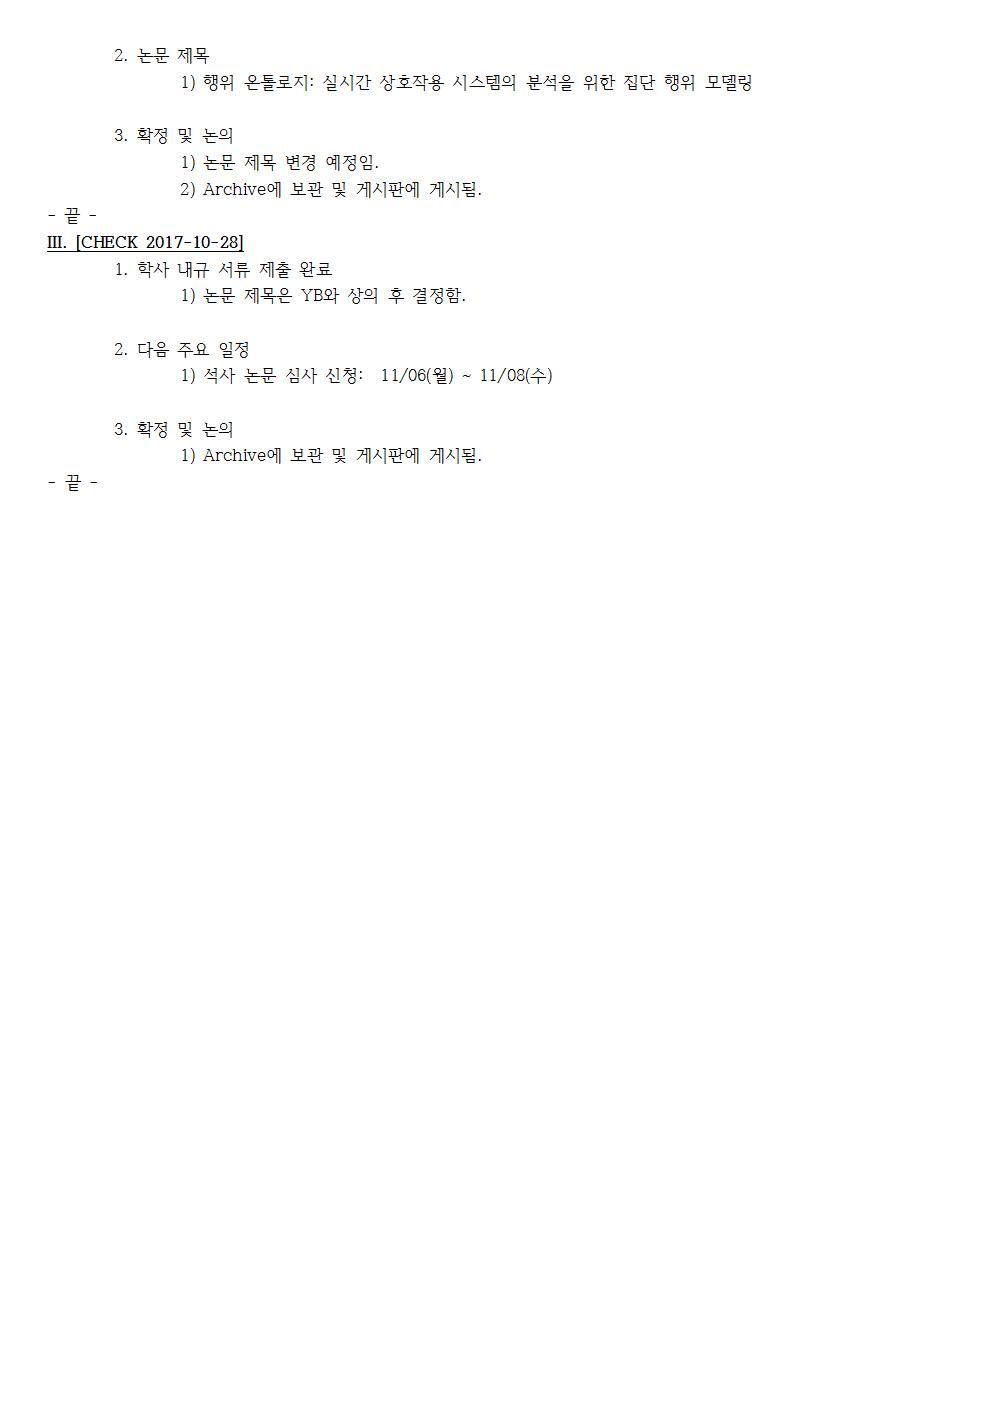 D-[17-100-PP-19]-[MS-G-Paper-JS]-[JS]-[2017-10-28]-[PLAN][DO][CHECK]002.jpg